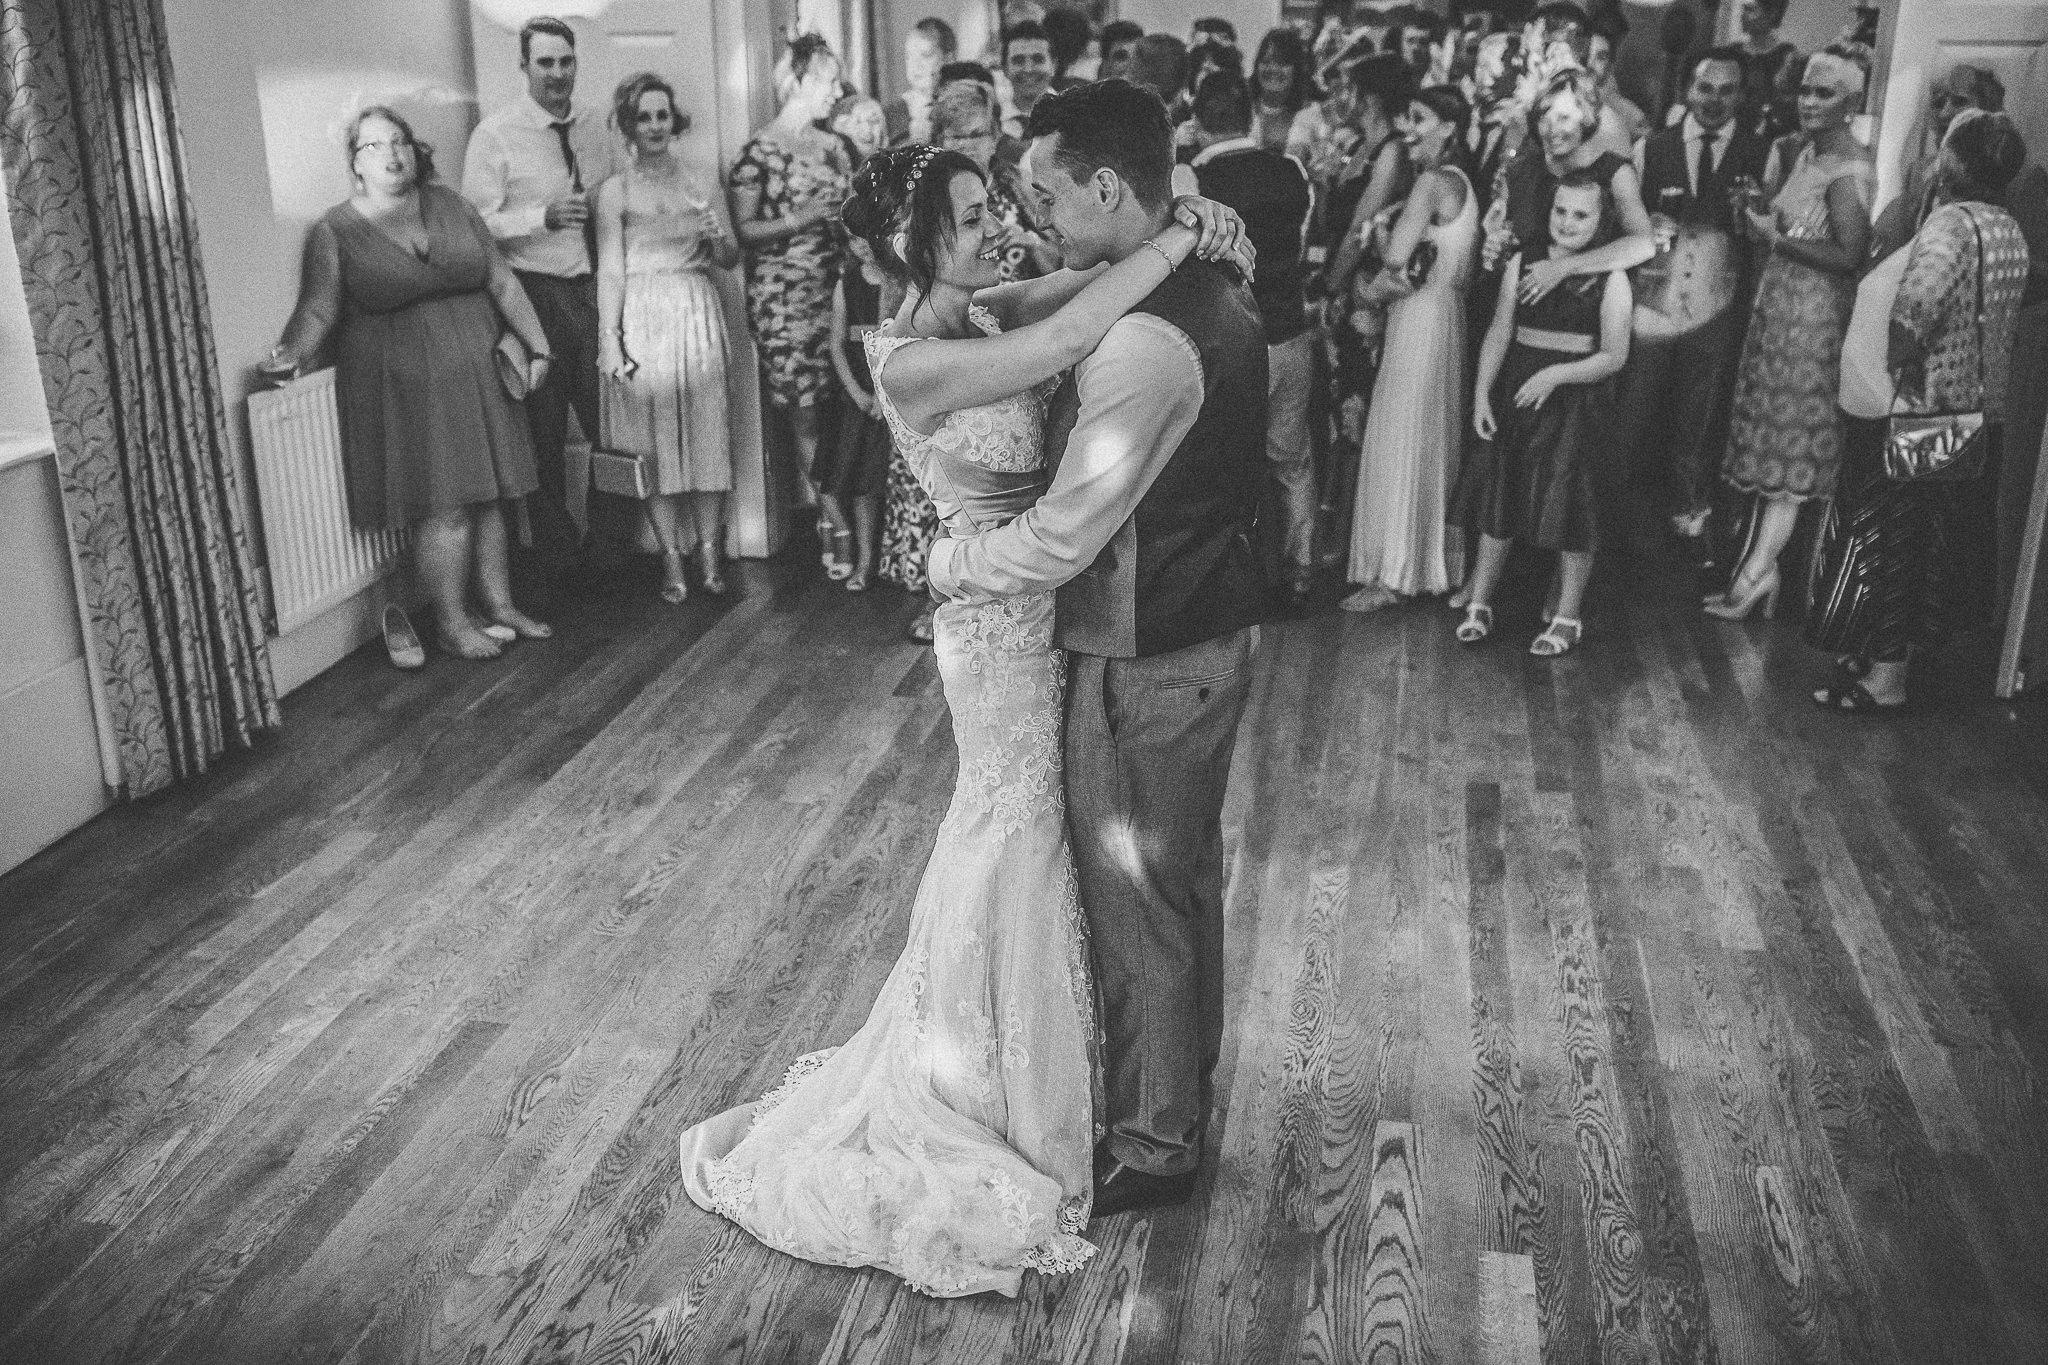 paul-marbrook-Caer-Llan-Wedding-Photographer-90092